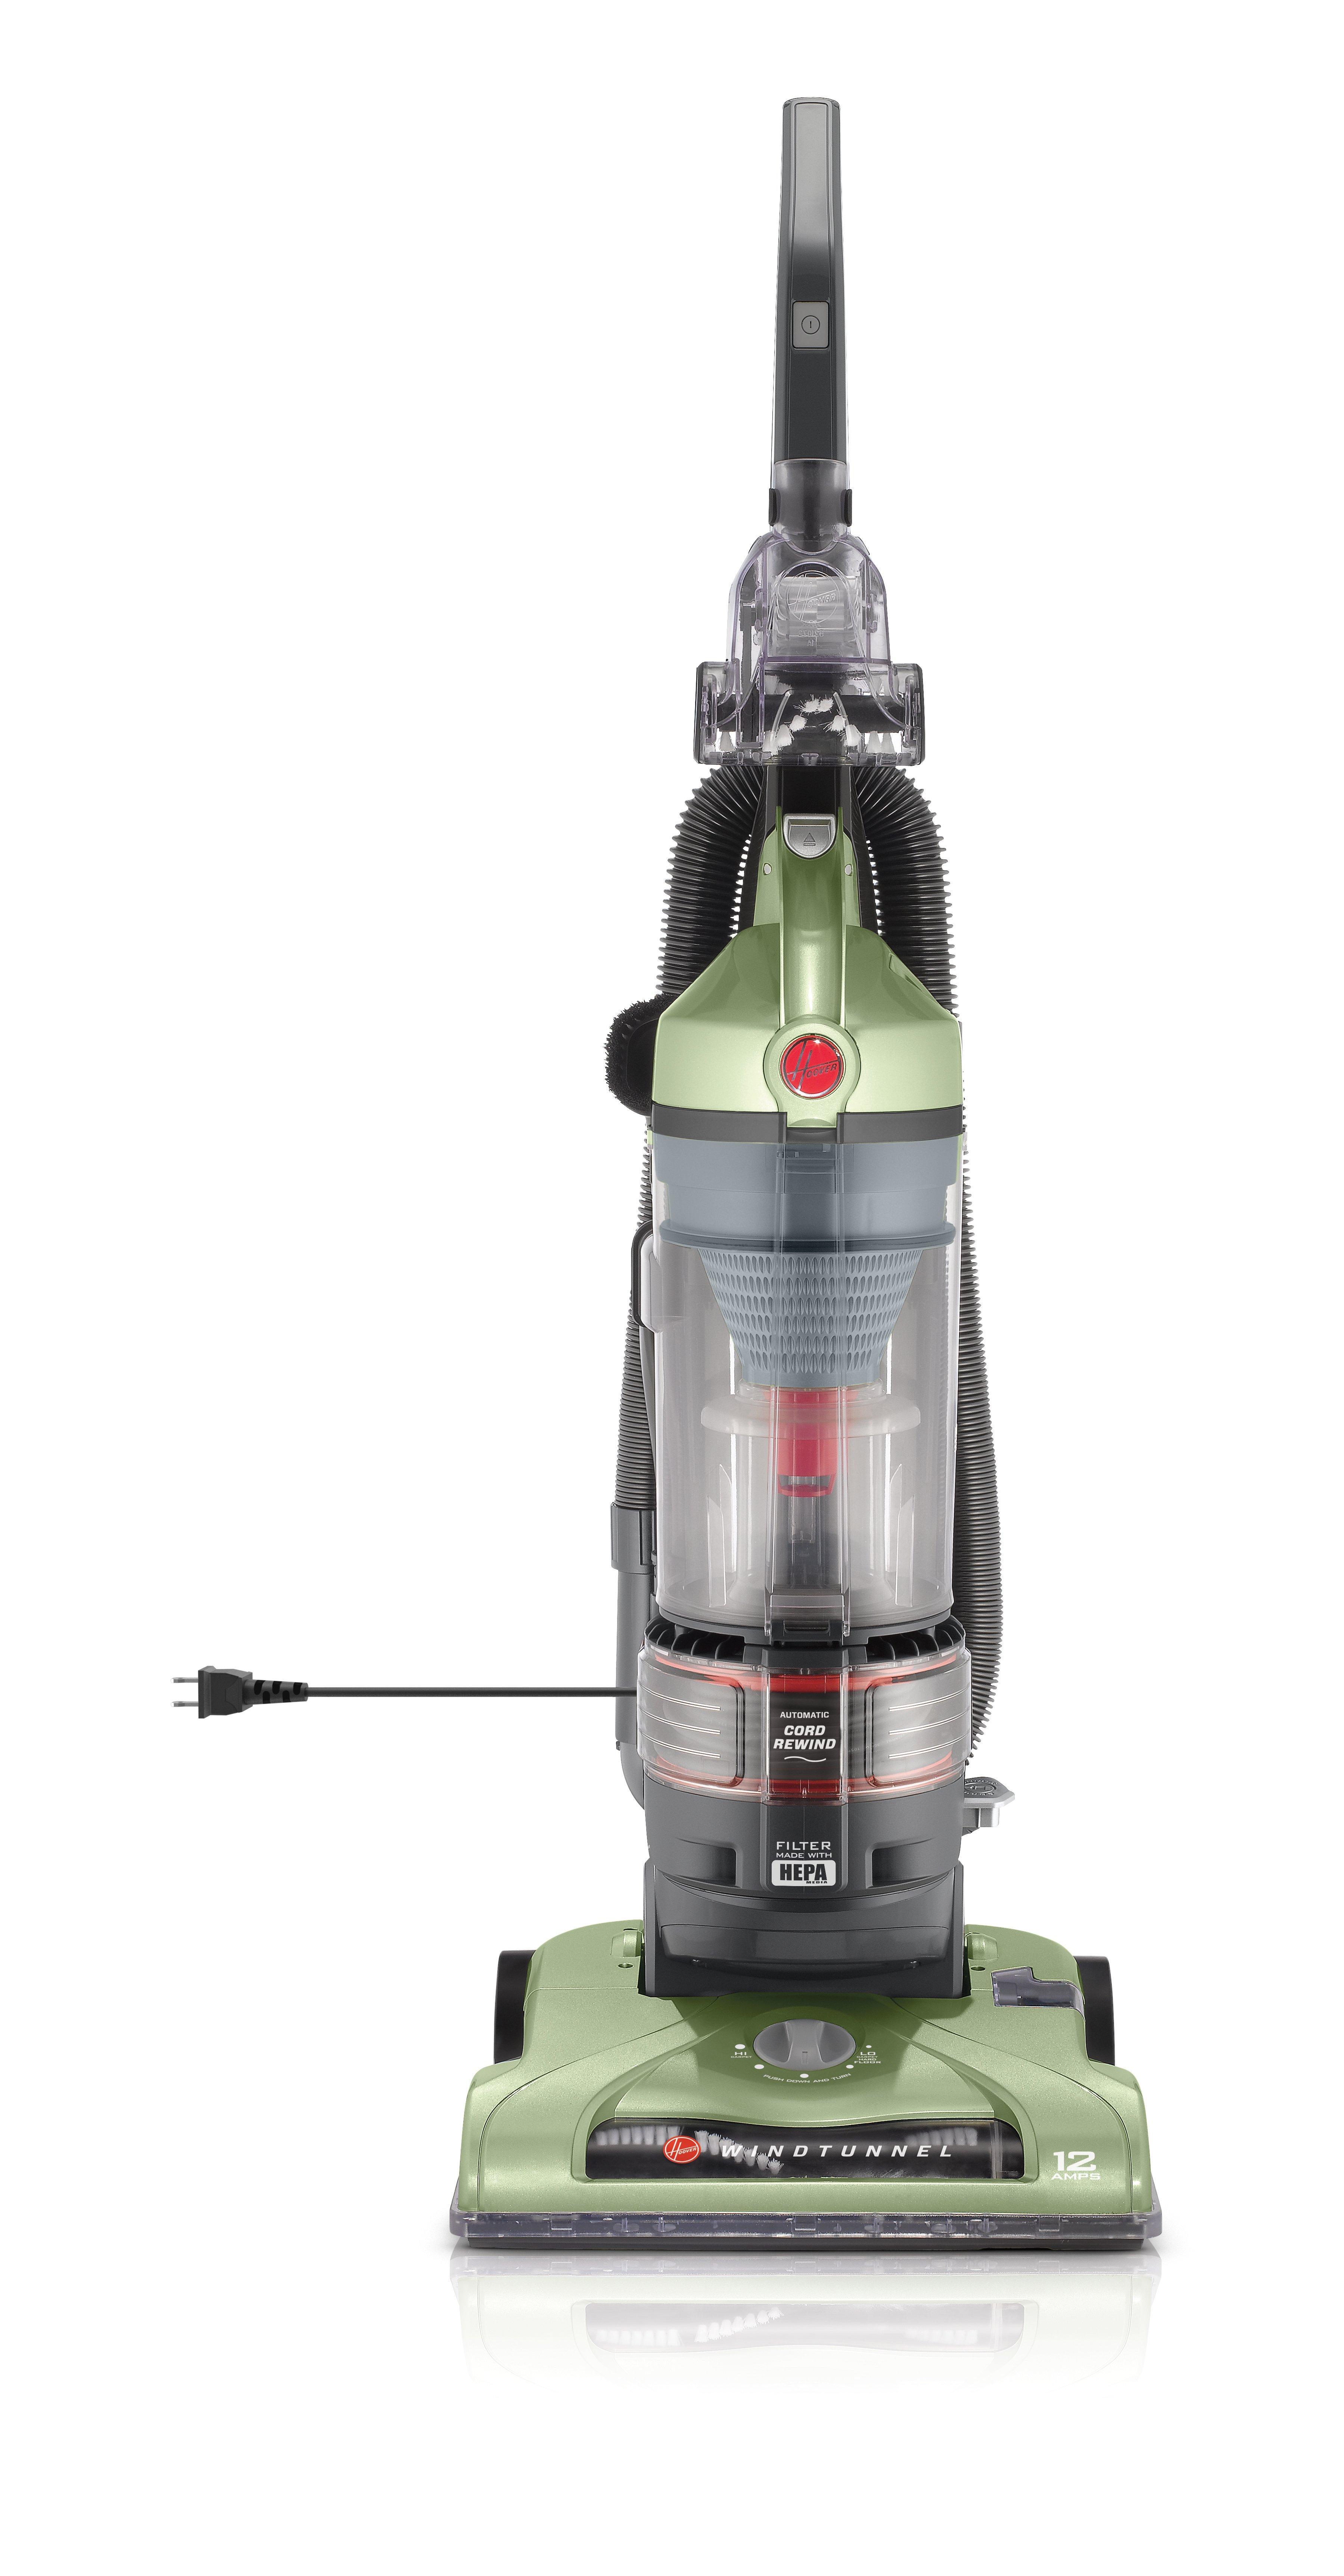 WindTunnel T-Series Rewind Plus Upright Vacuum